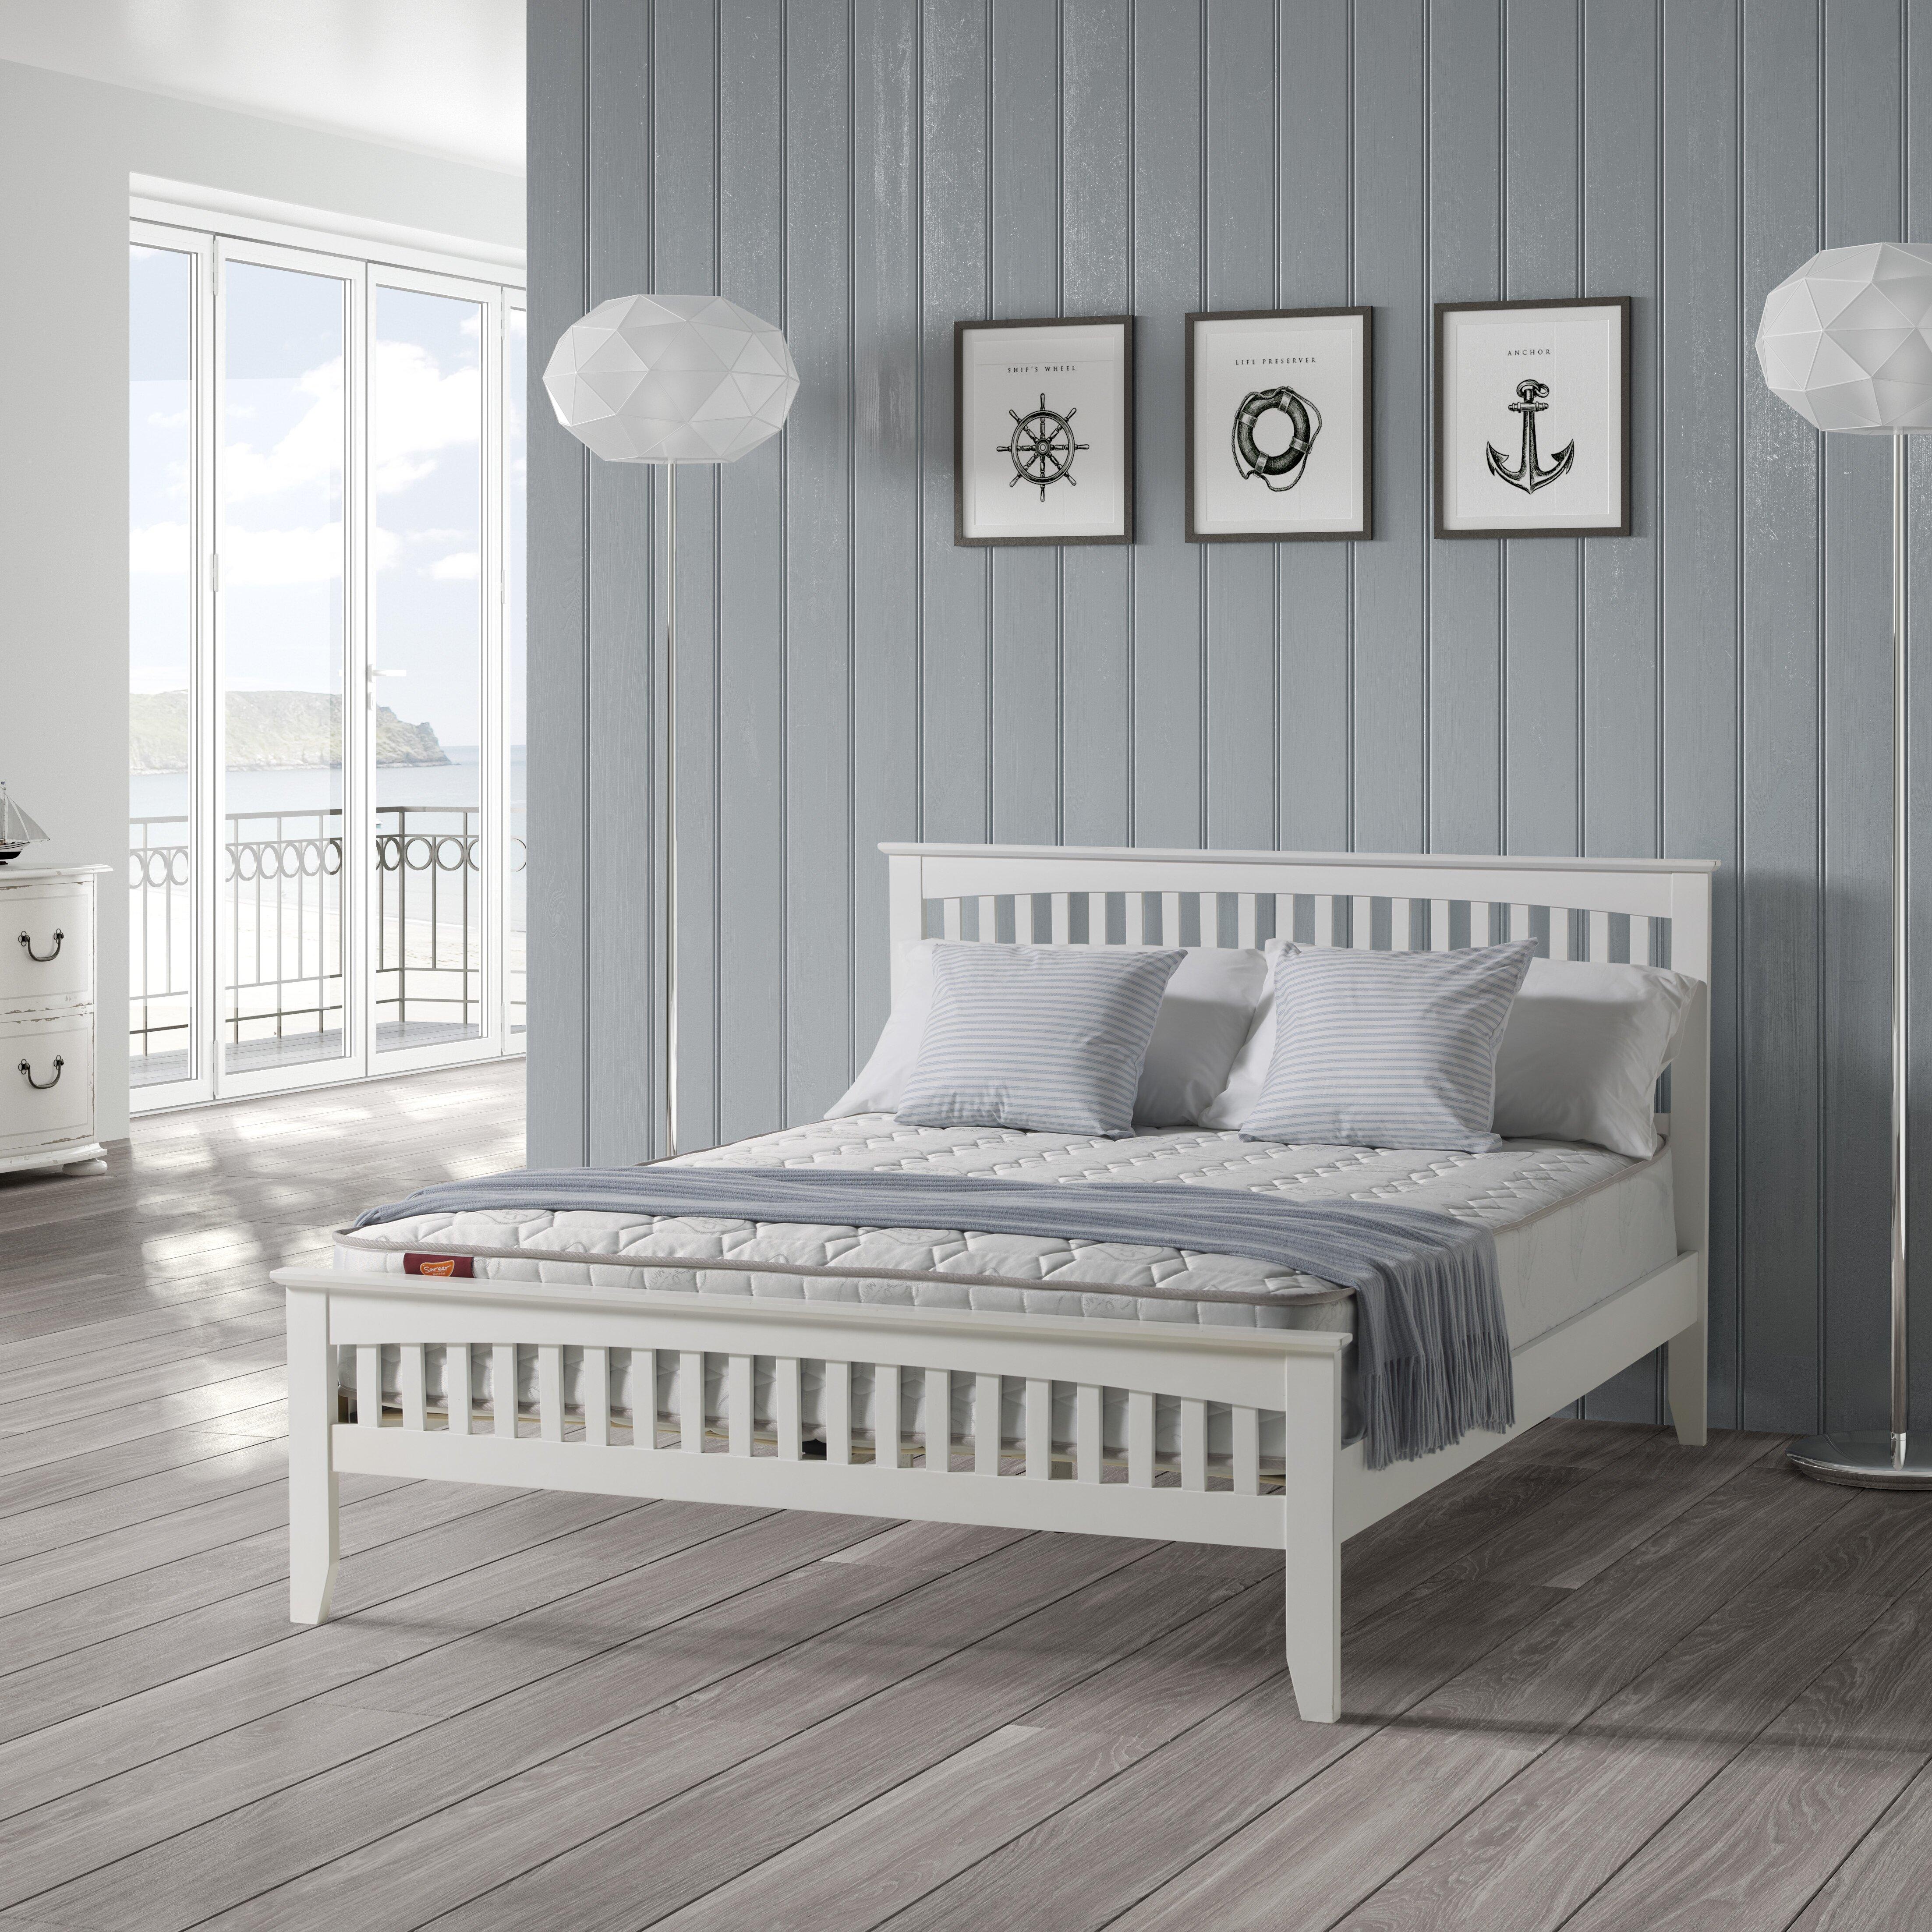 Home loft concept marina bed frame reviews for Home loft concept bunk bed